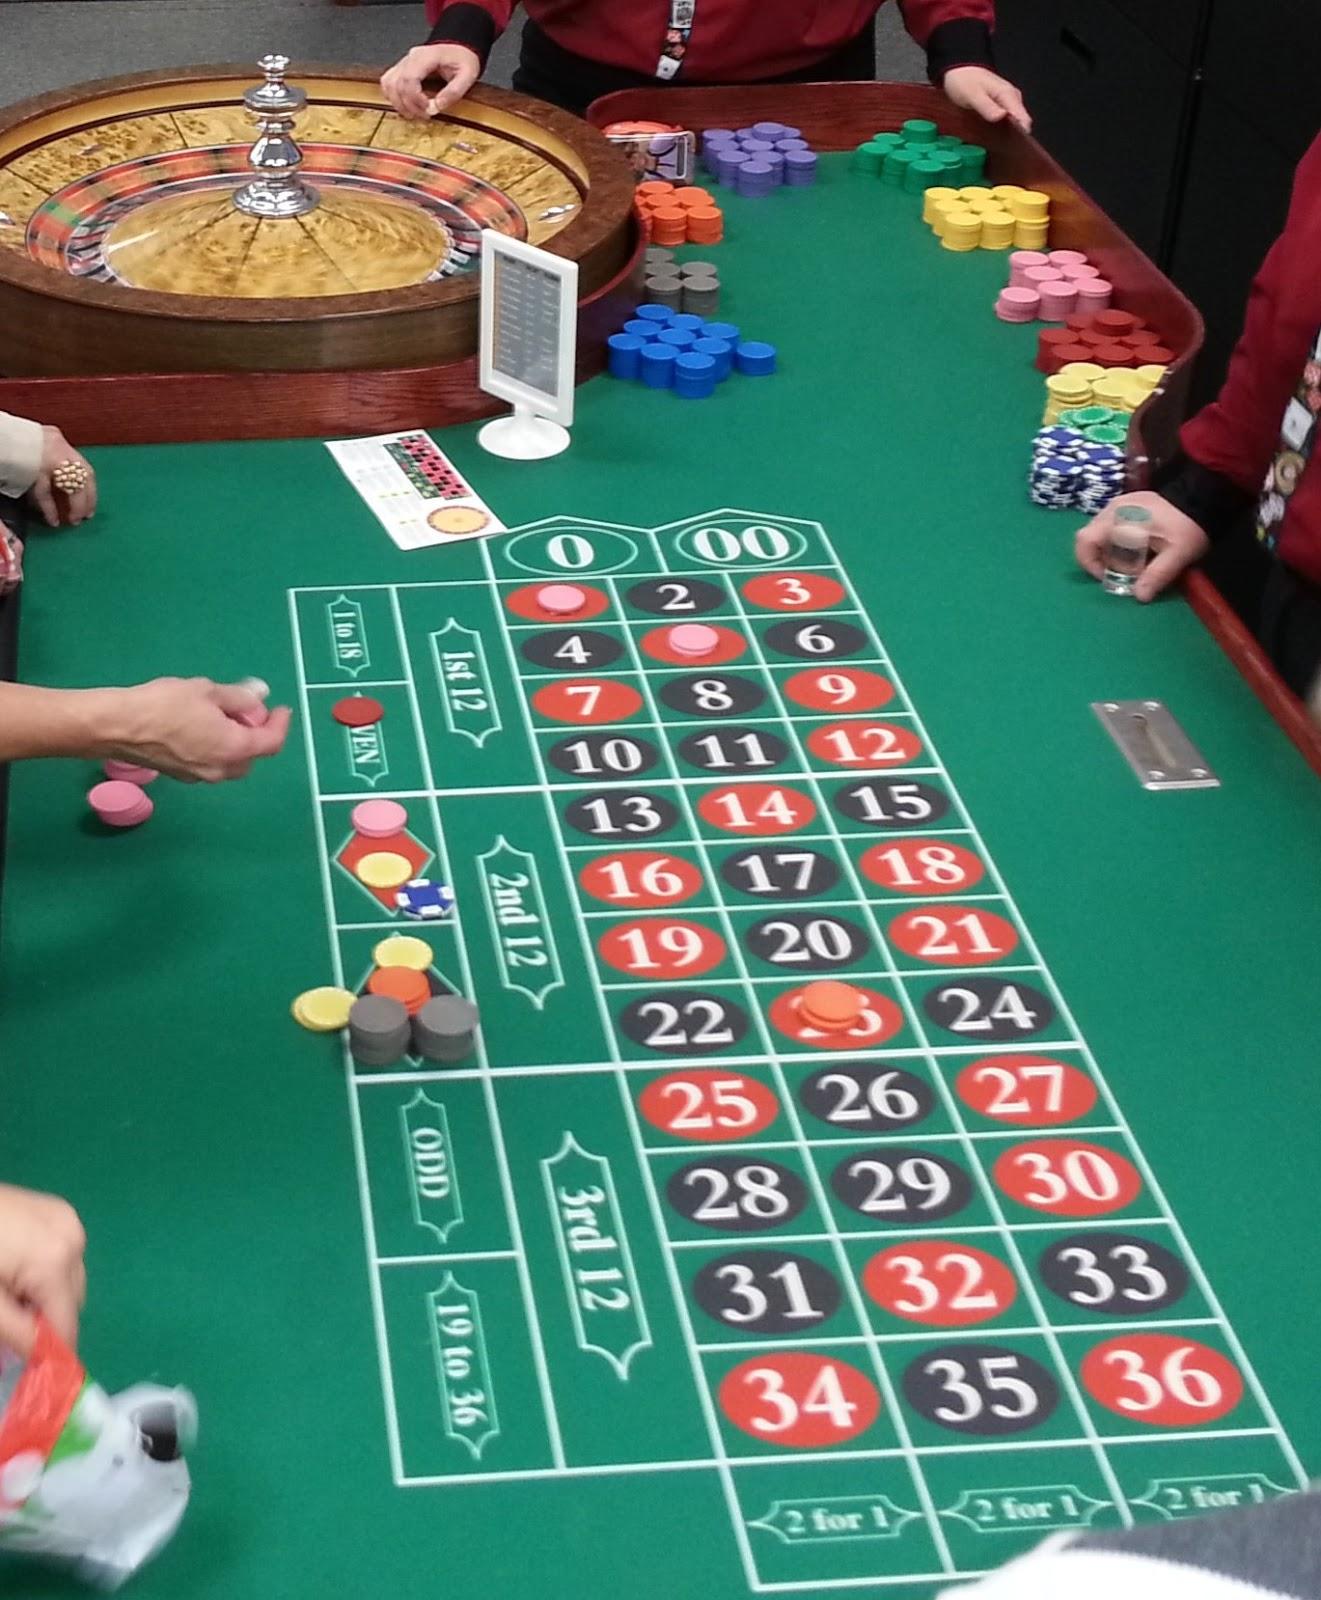 Välkomstbonus casino roulette Rules 17155